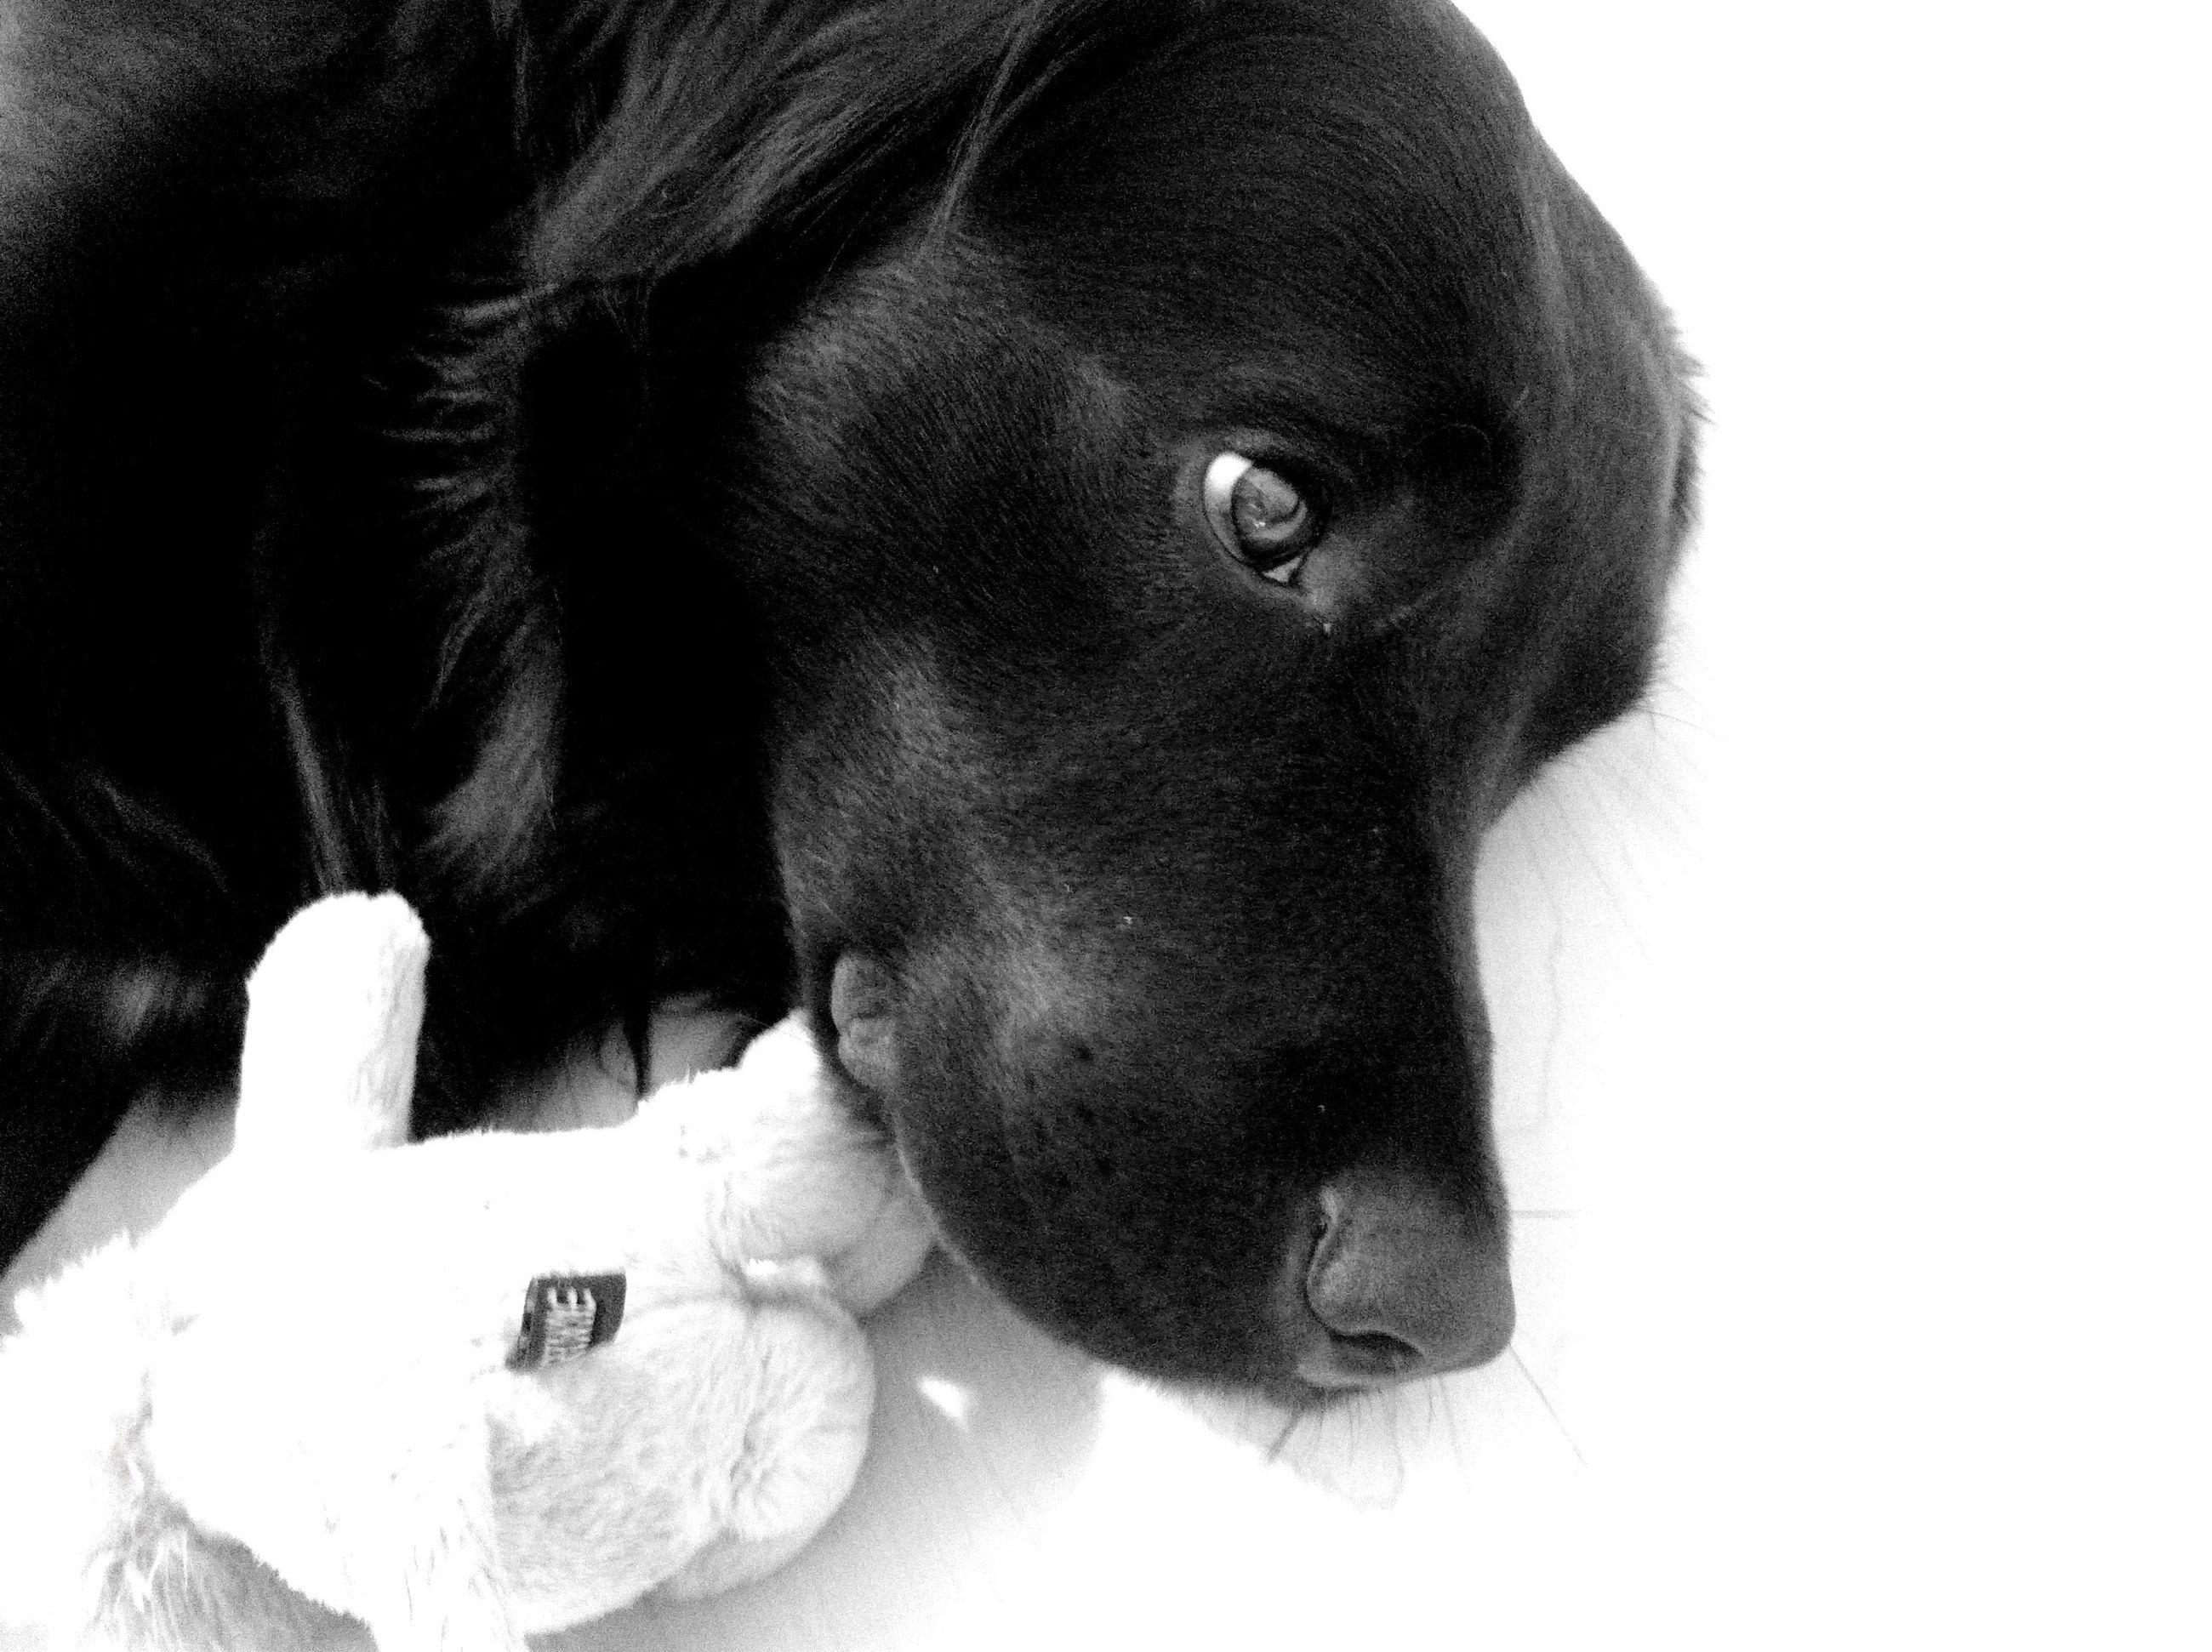 dog, mammal, pets, puppy, domestic animals, close-up, no people